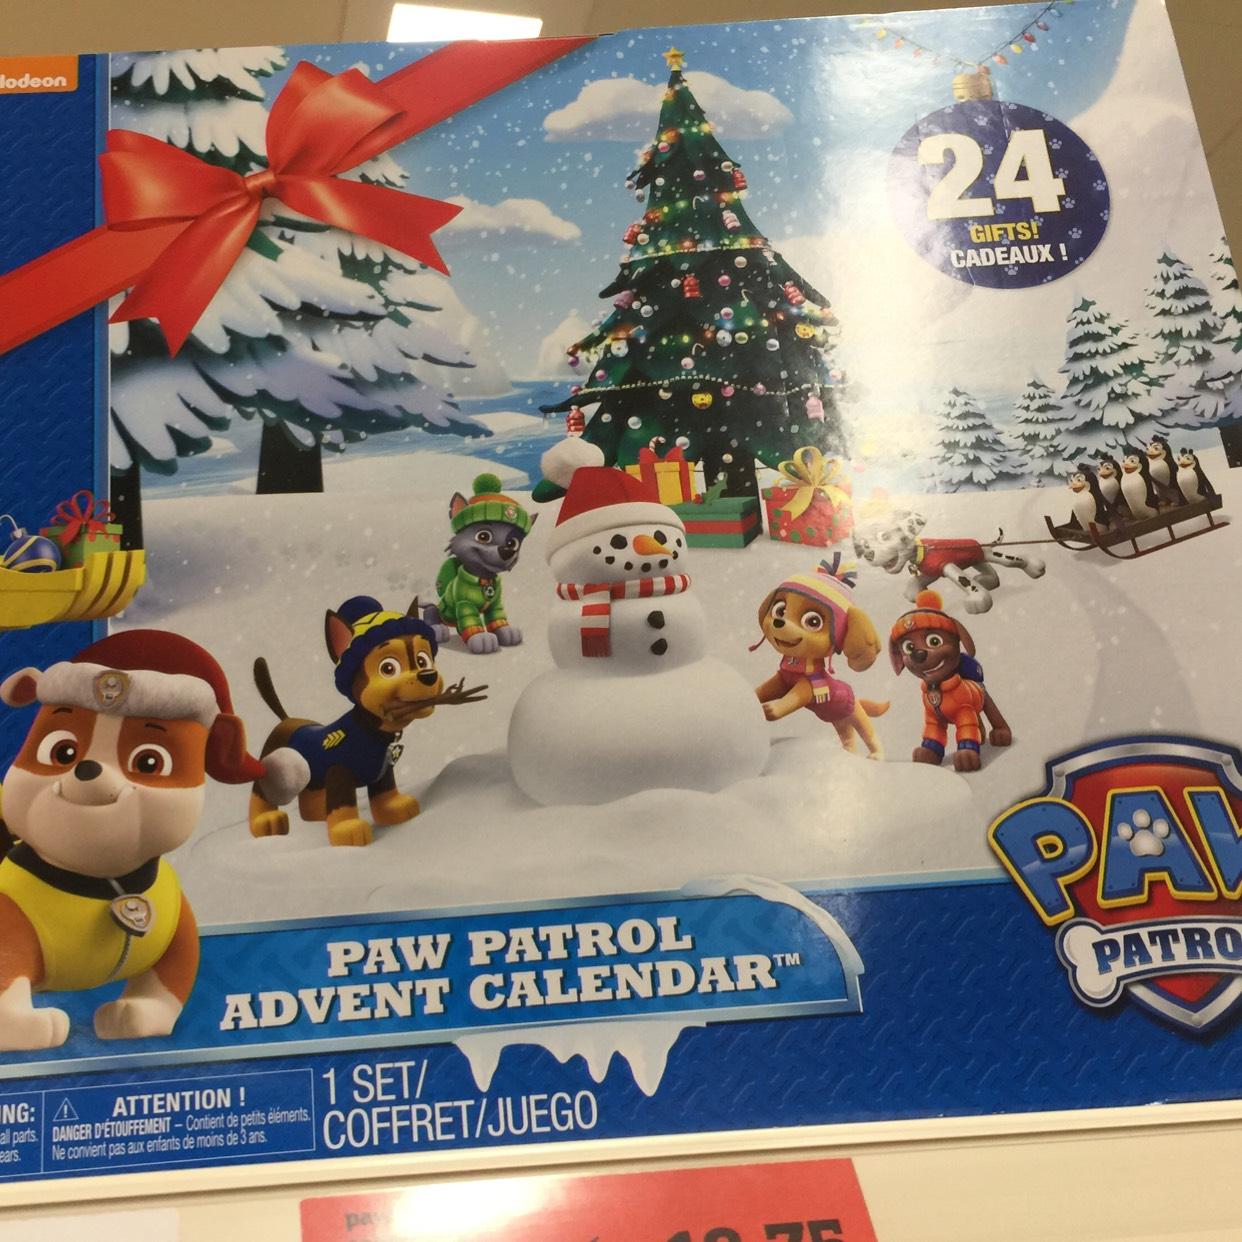 Paw patrol advent calendar £18.75 @ Sainsbury's Cheshire oaks